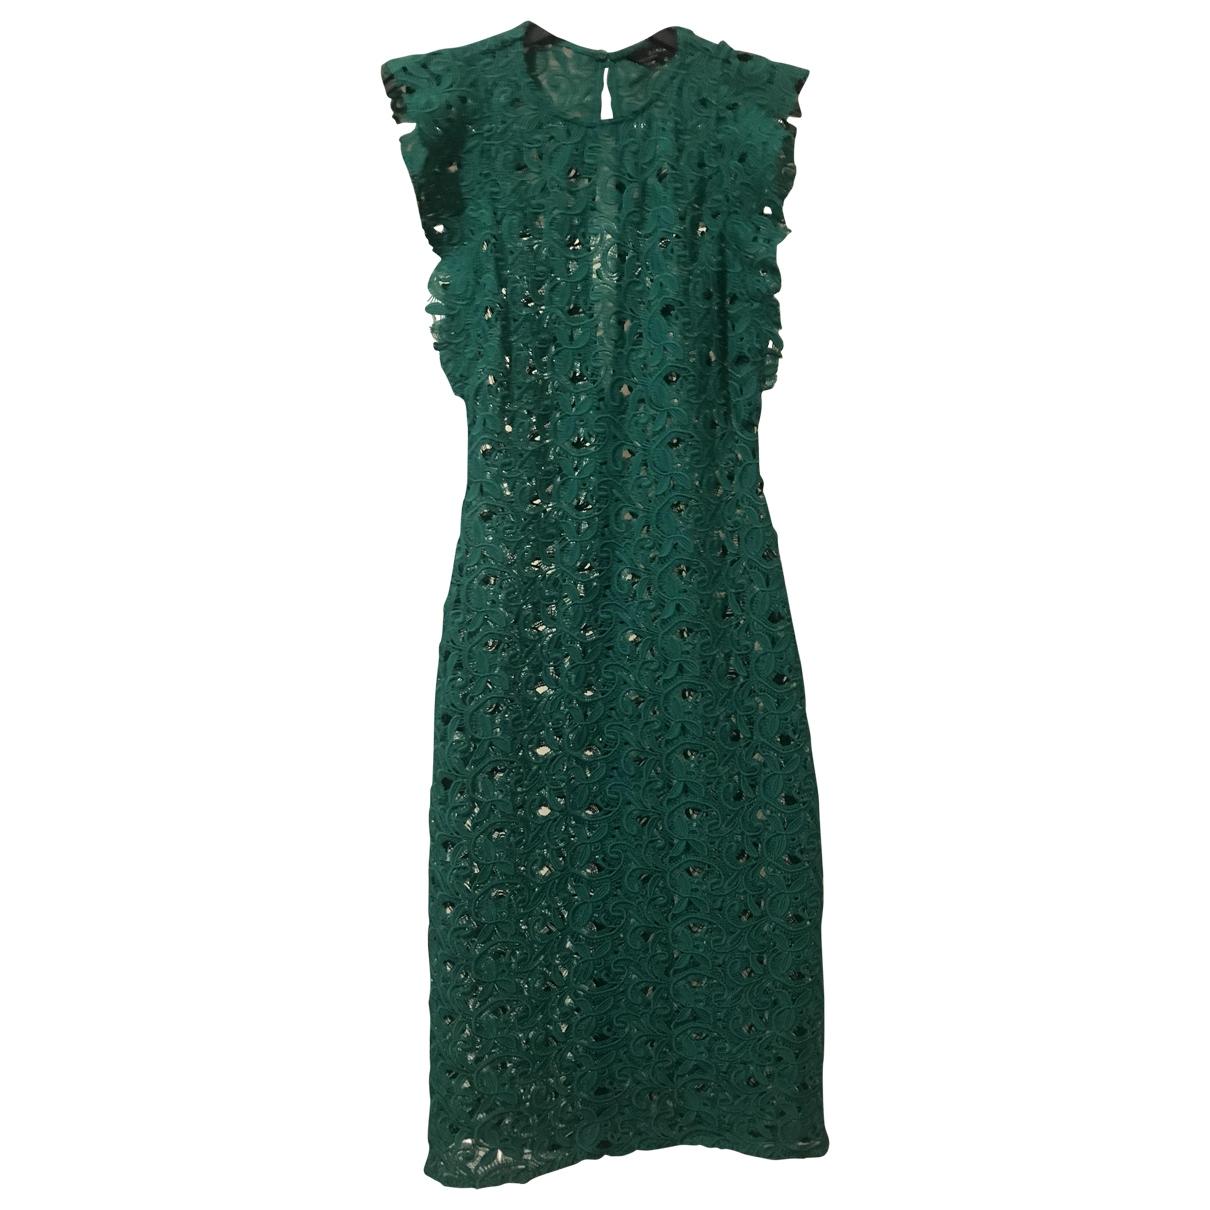 Zara \N Green Cotton dress for Women XS International